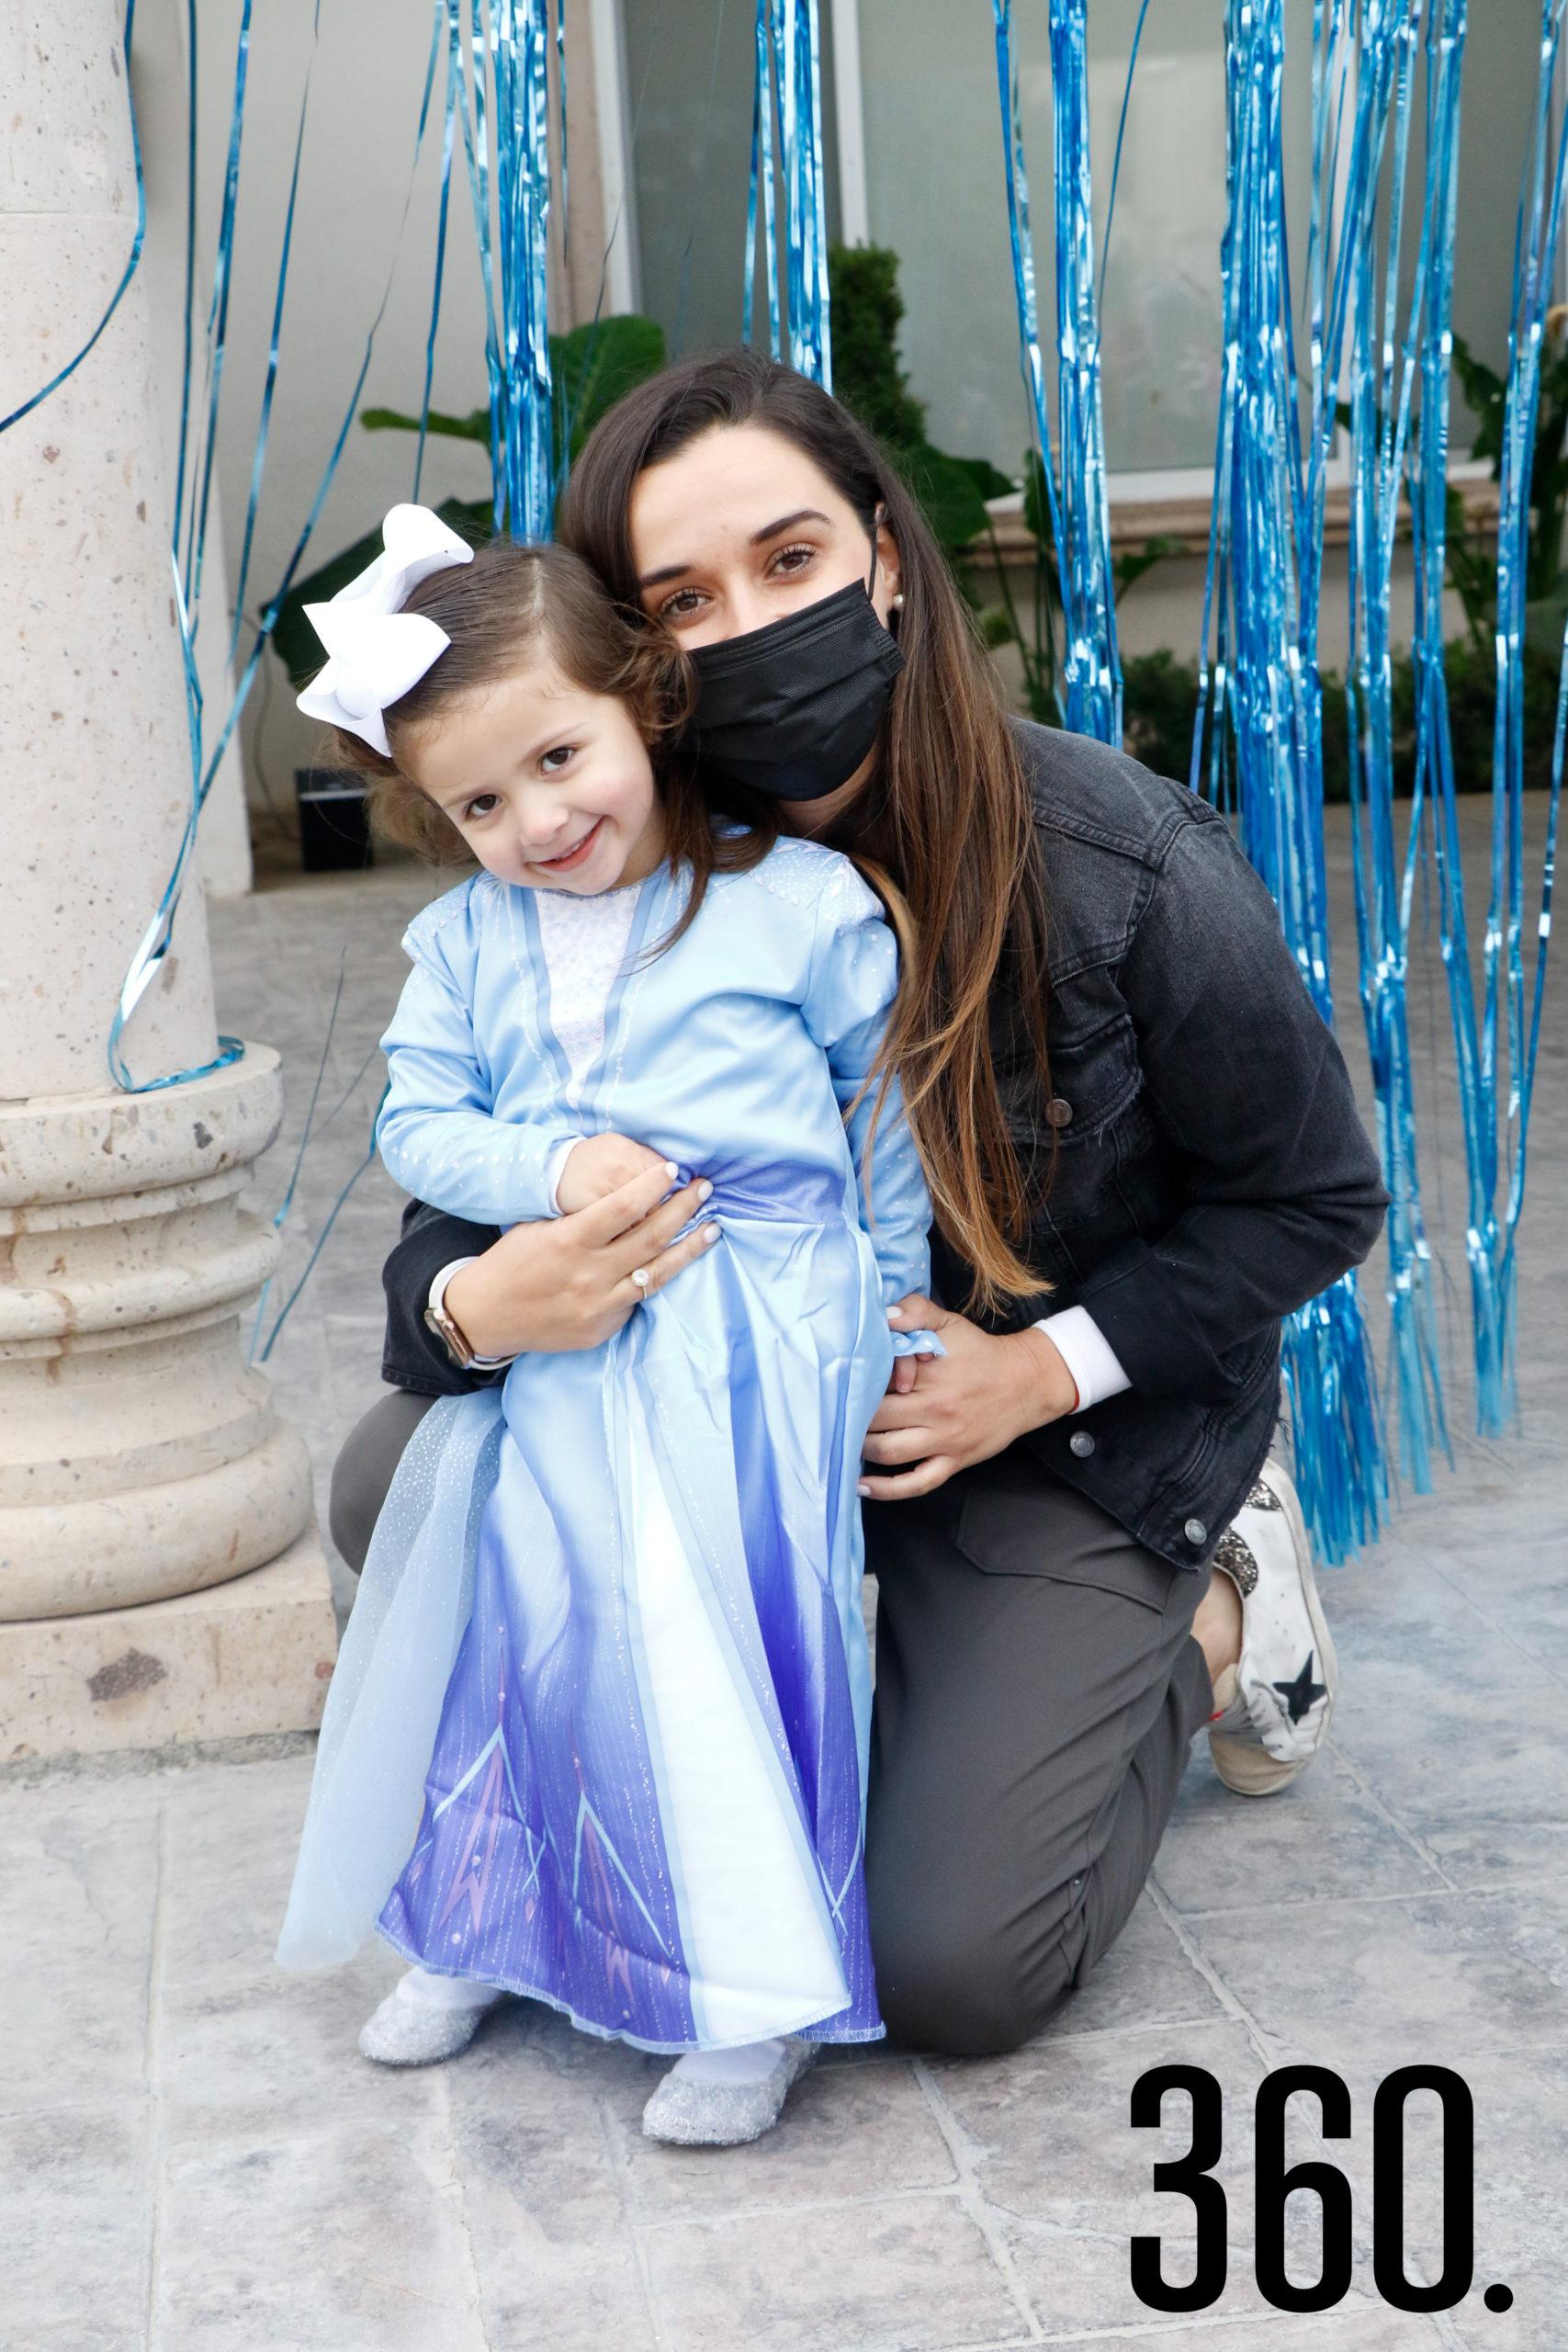 Mariana con su tía, Ana Lucía Paz.